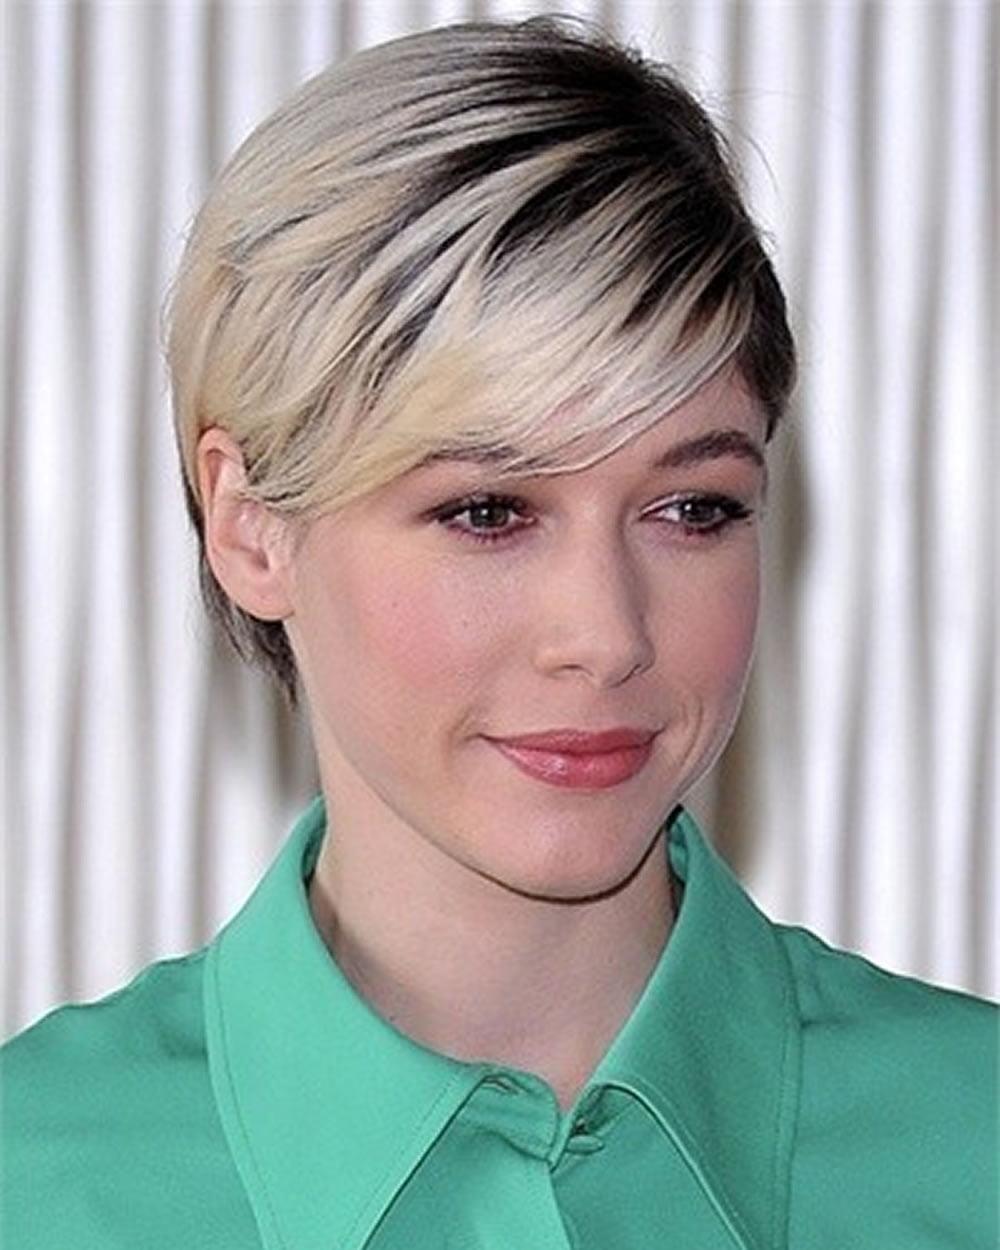 Blonde balayage short hair 2019 - Hair Colors